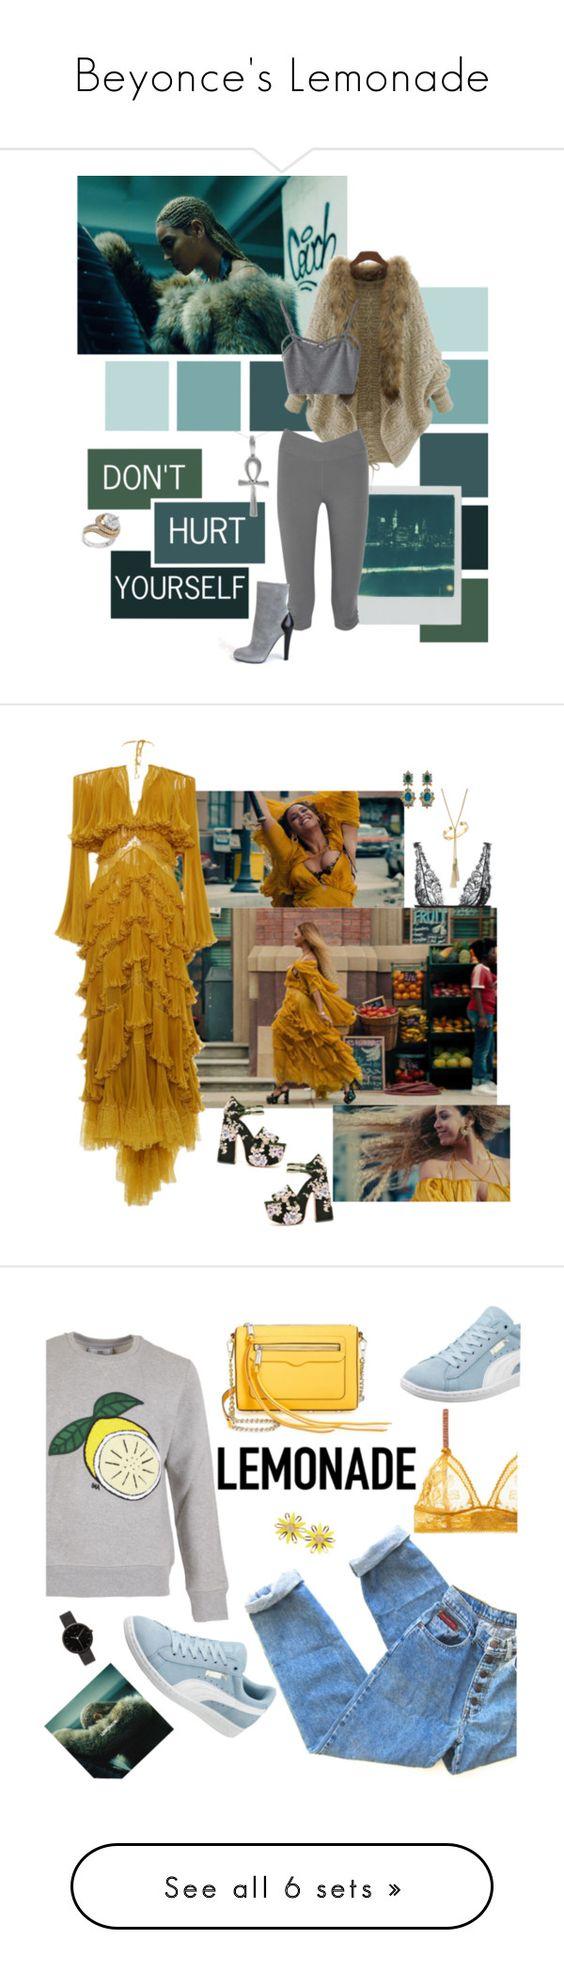 """Beyonce's Lemonade"" by polyvore-editorial ❤ liked on Polyvore featuring Beyonce, lemonade, Polaroid, WithChic, Tressa, Simon G., Yummie by Heather Thomson, Posh Girl, Roberto Cavalli and La Perla"